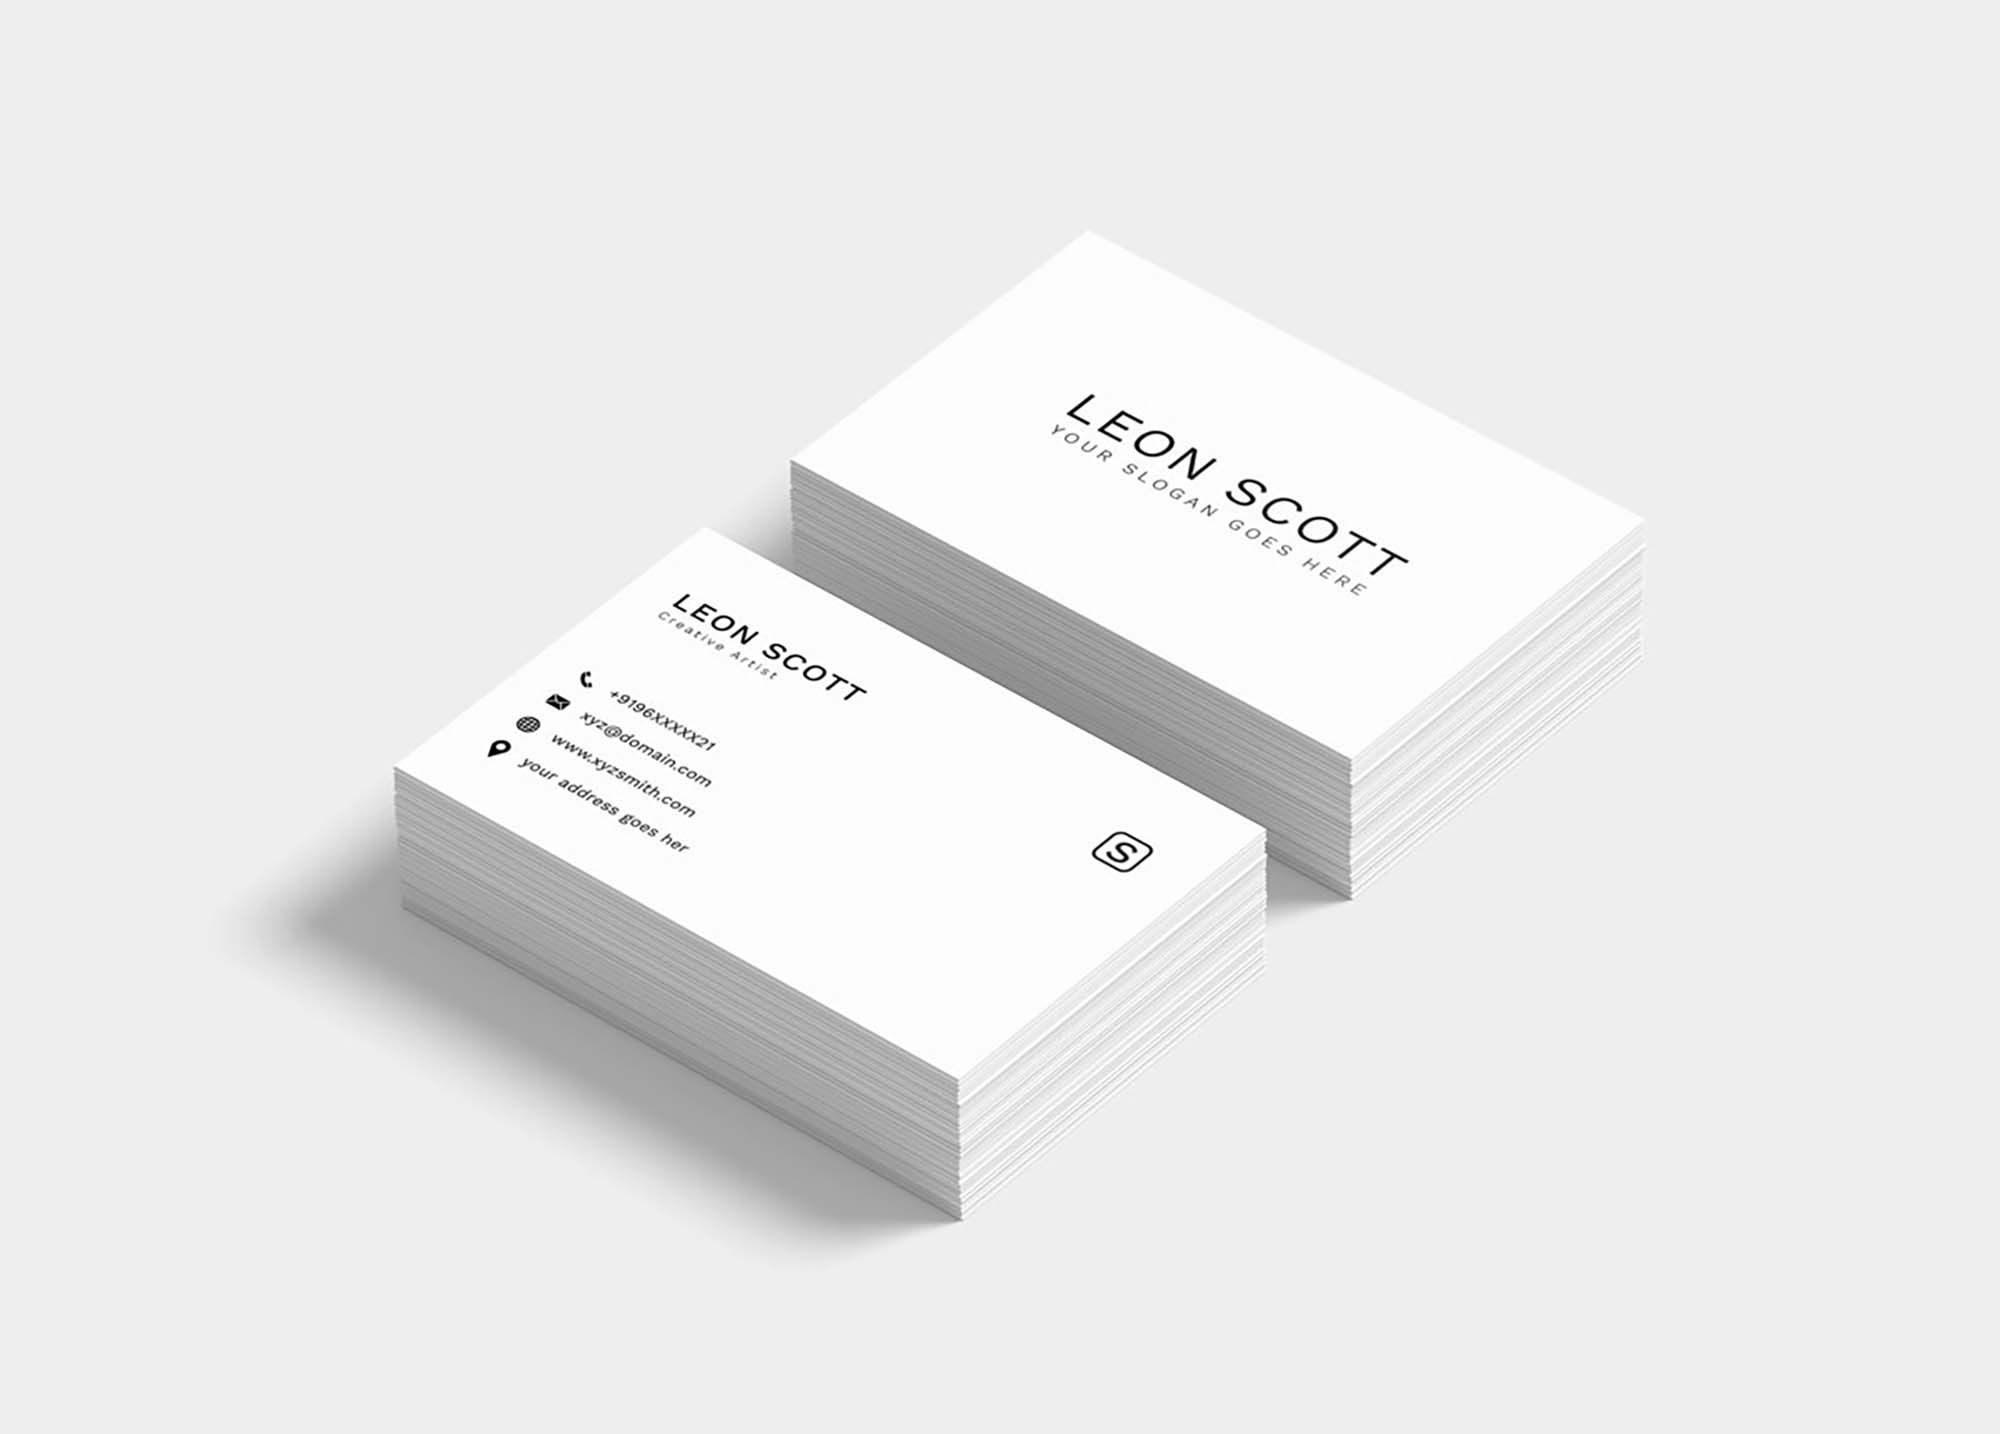 004 Breathtaking Minimalist Busines Card Template Psd Design Full